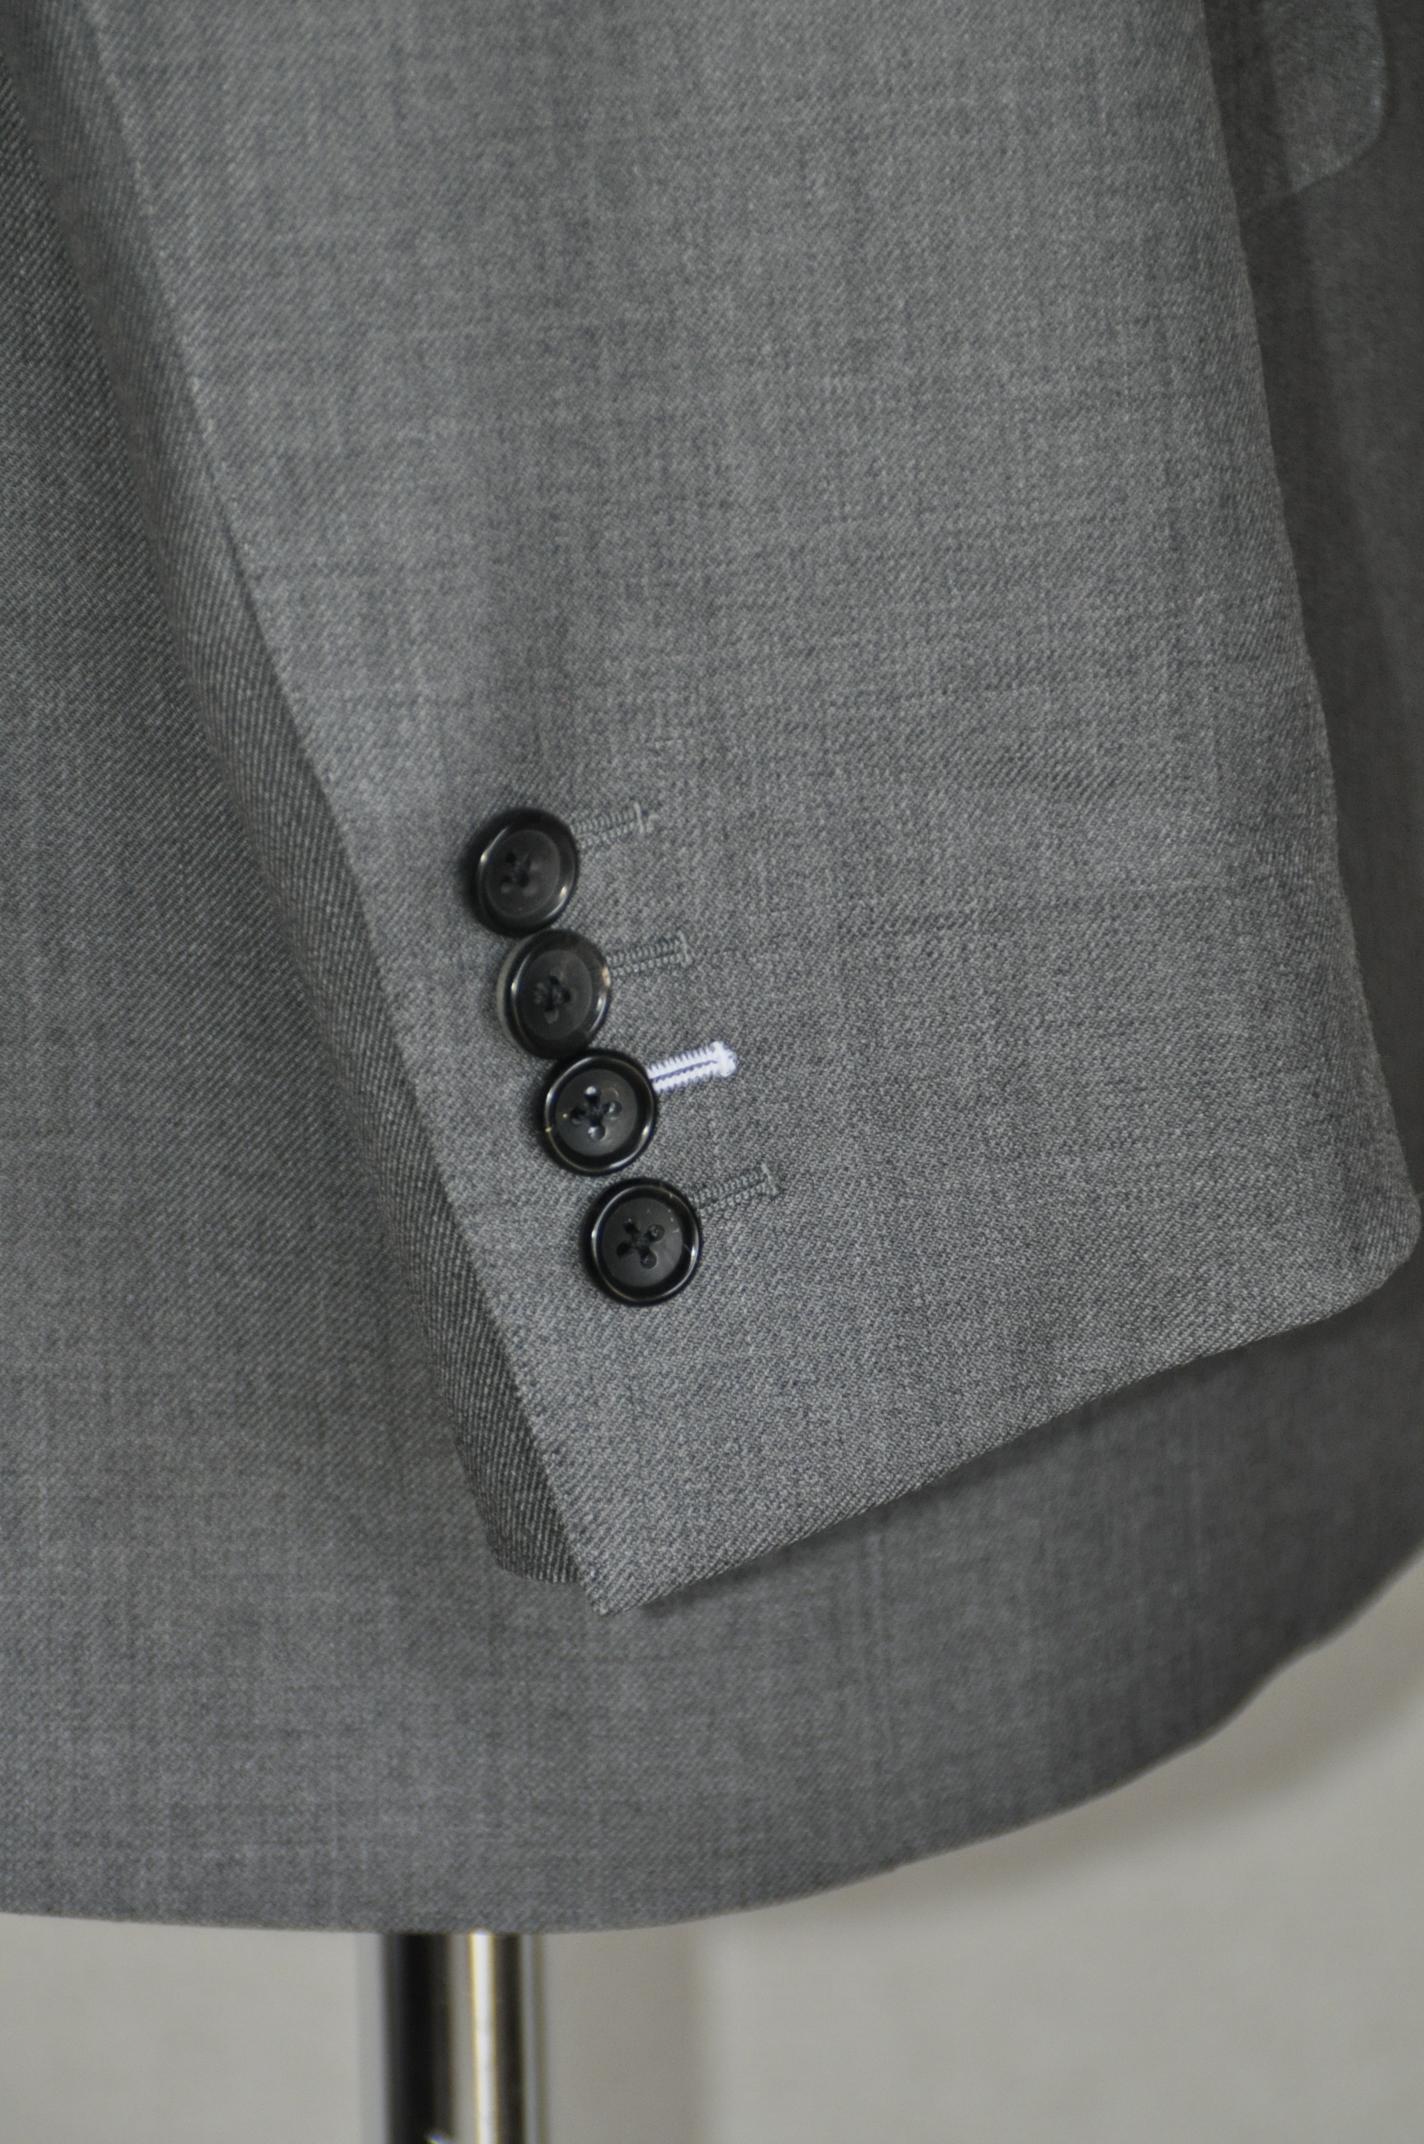 DSC02001 ボタンホール糸色変更 名古屋の完全予約制オーダースーツ専門店DEFFERT